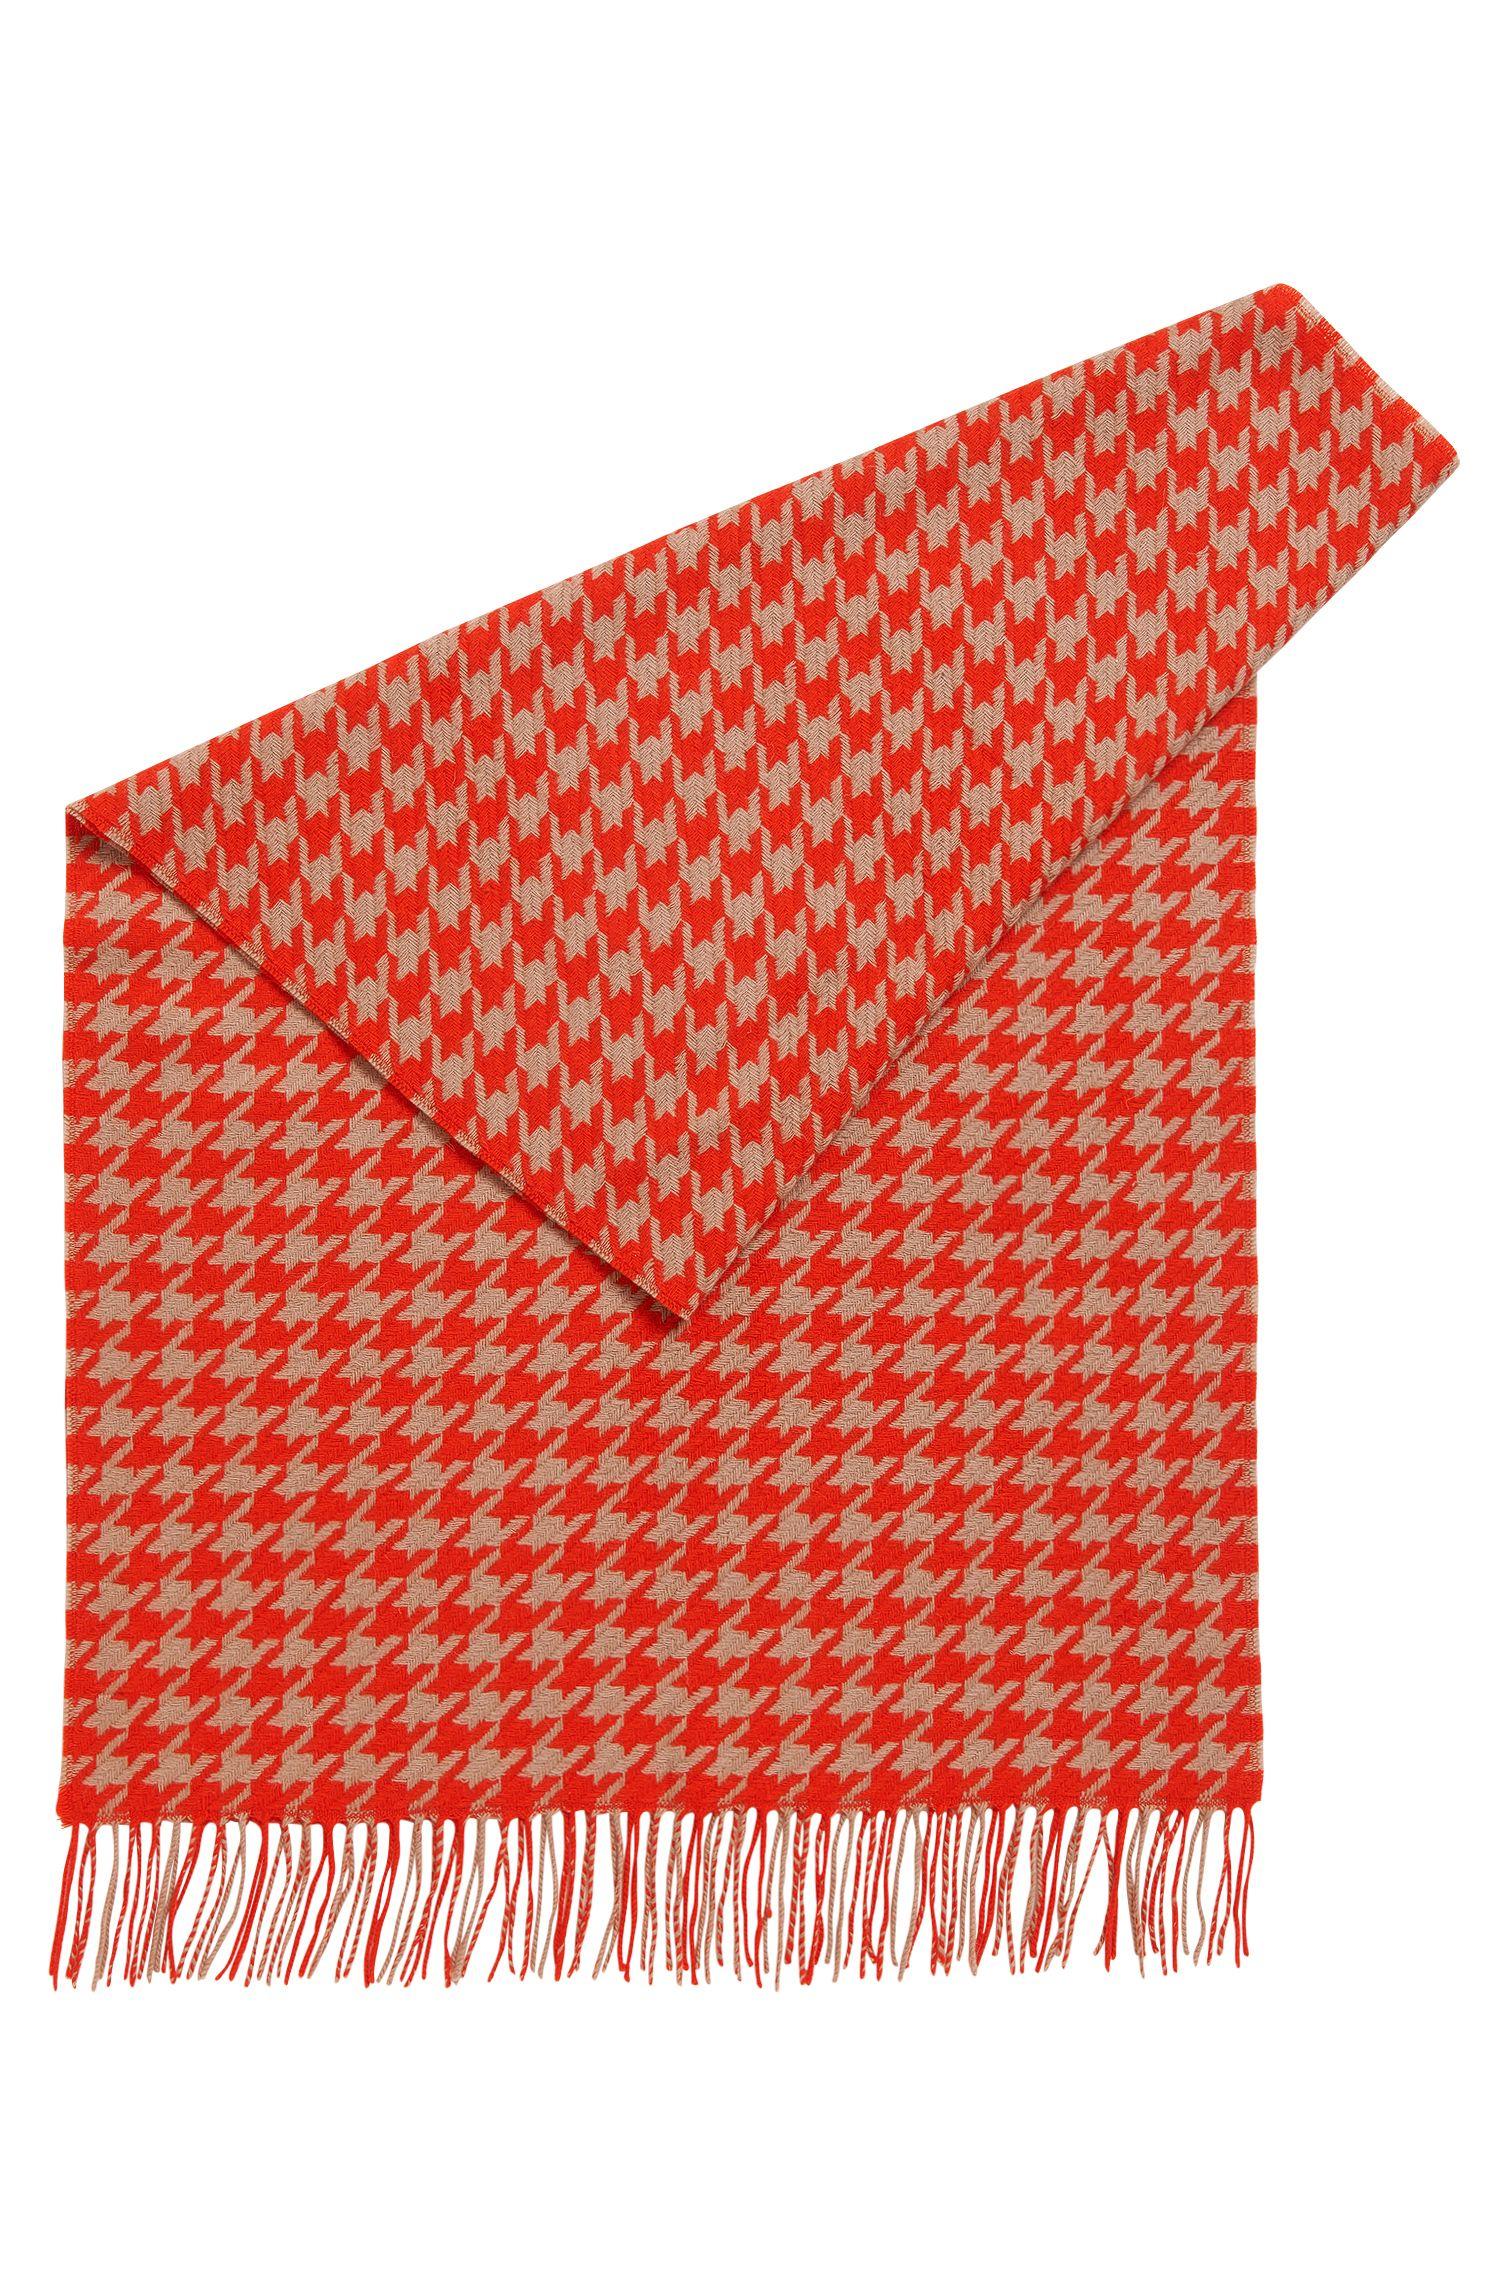 Sciarpa in lana vergine con motivo pied de poule